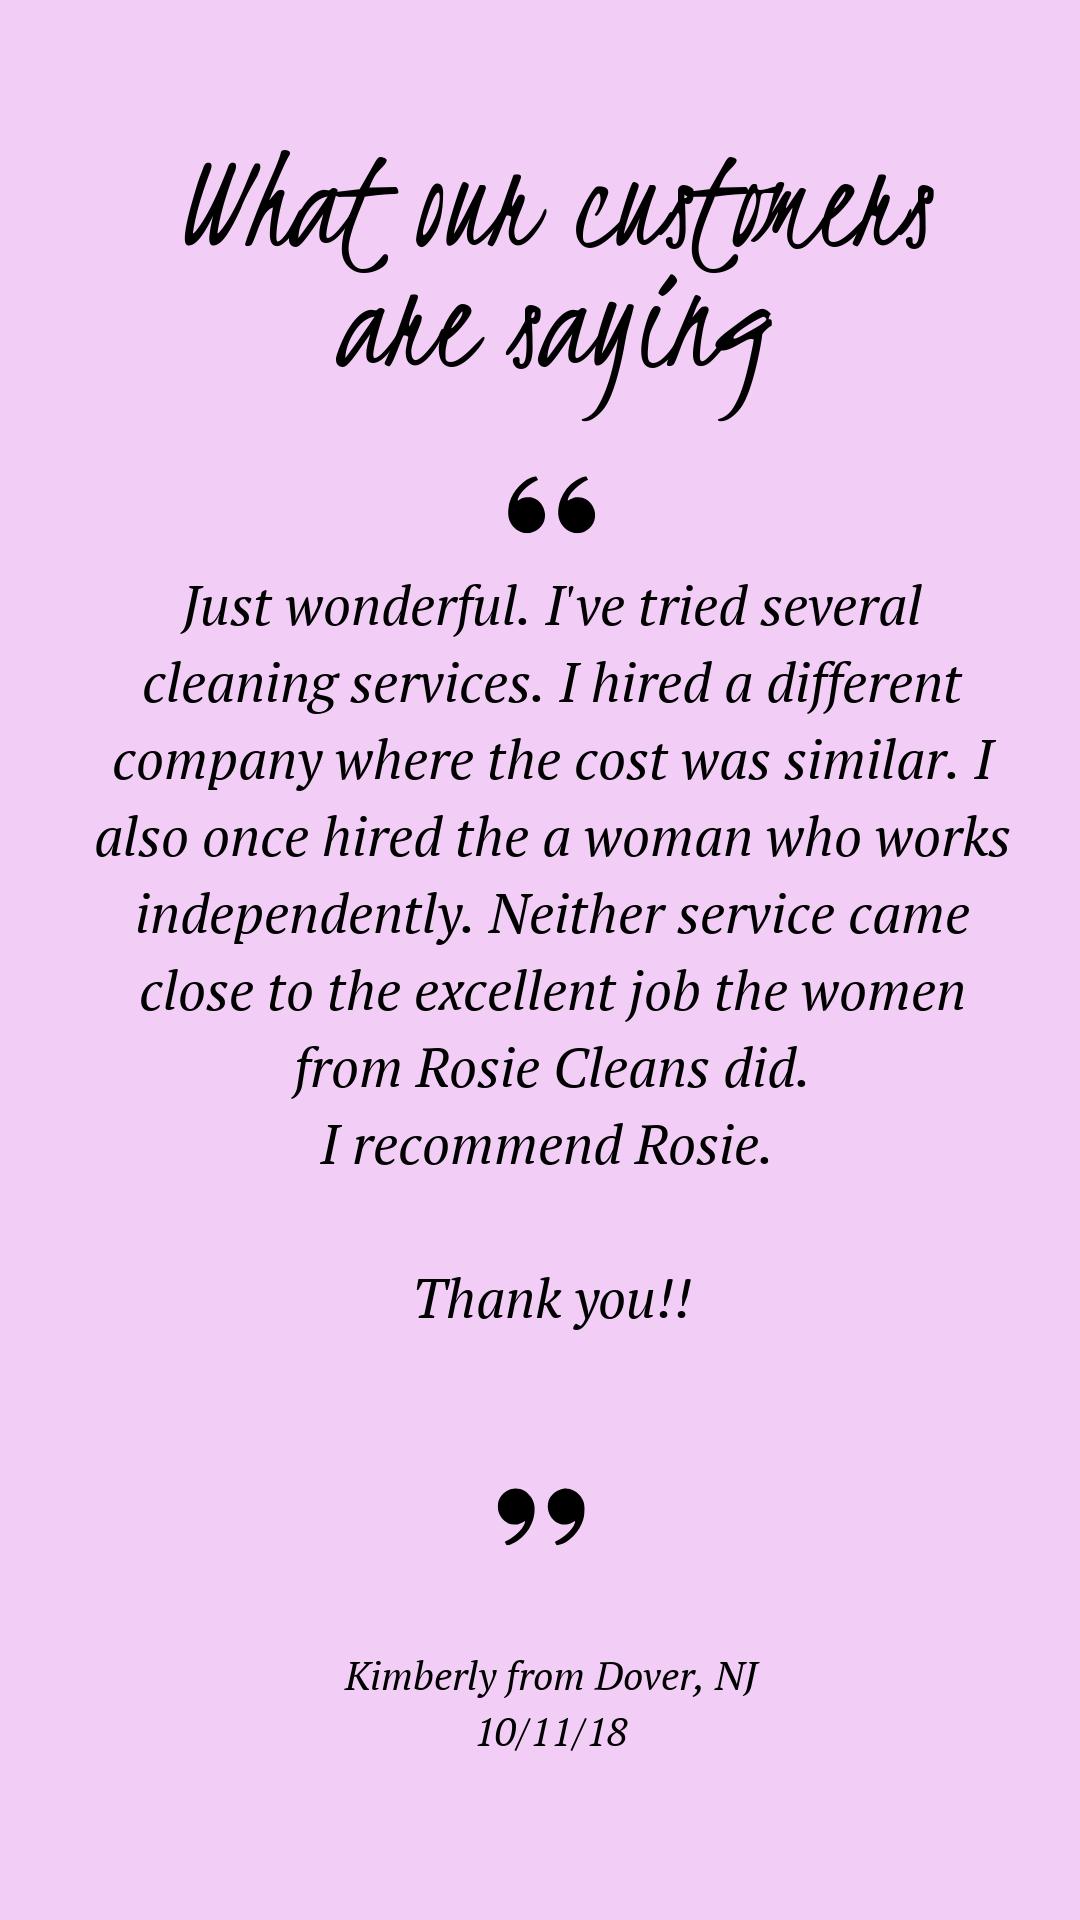 Rosie Cleans Cleaning team